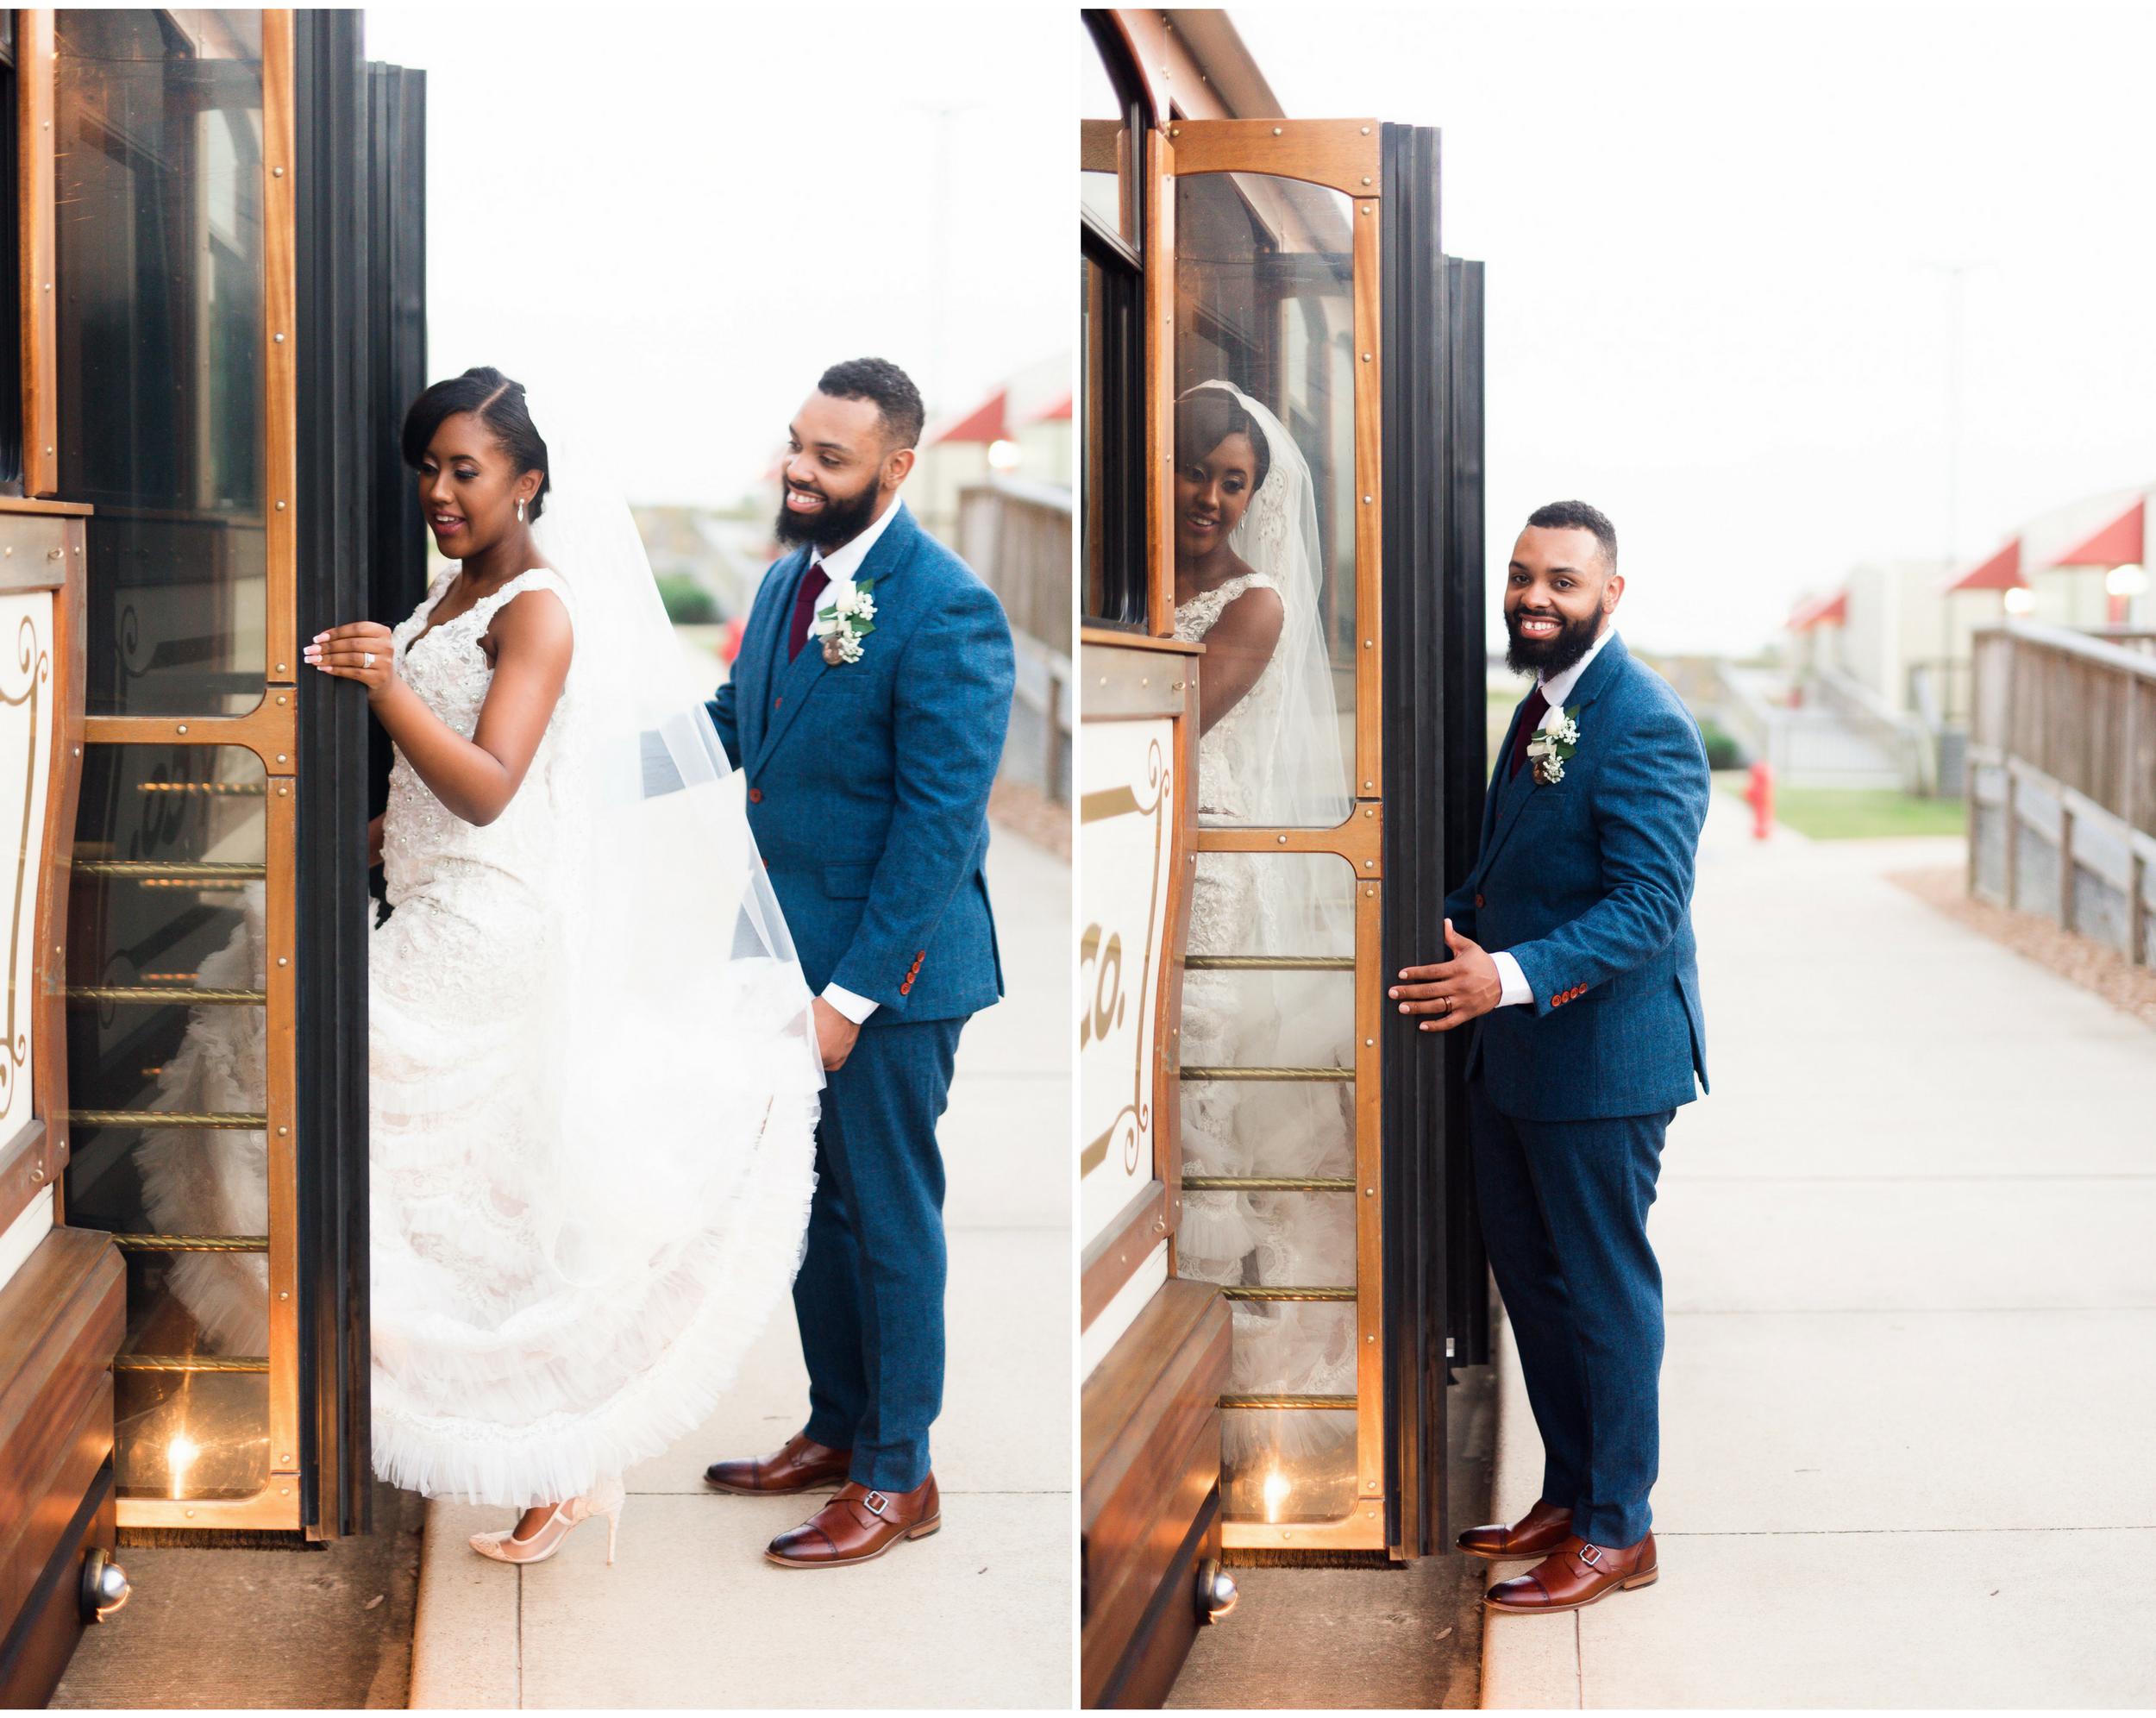 TC-Jessica-Garr-Pharris-Photography-Real-Wedding-5.png